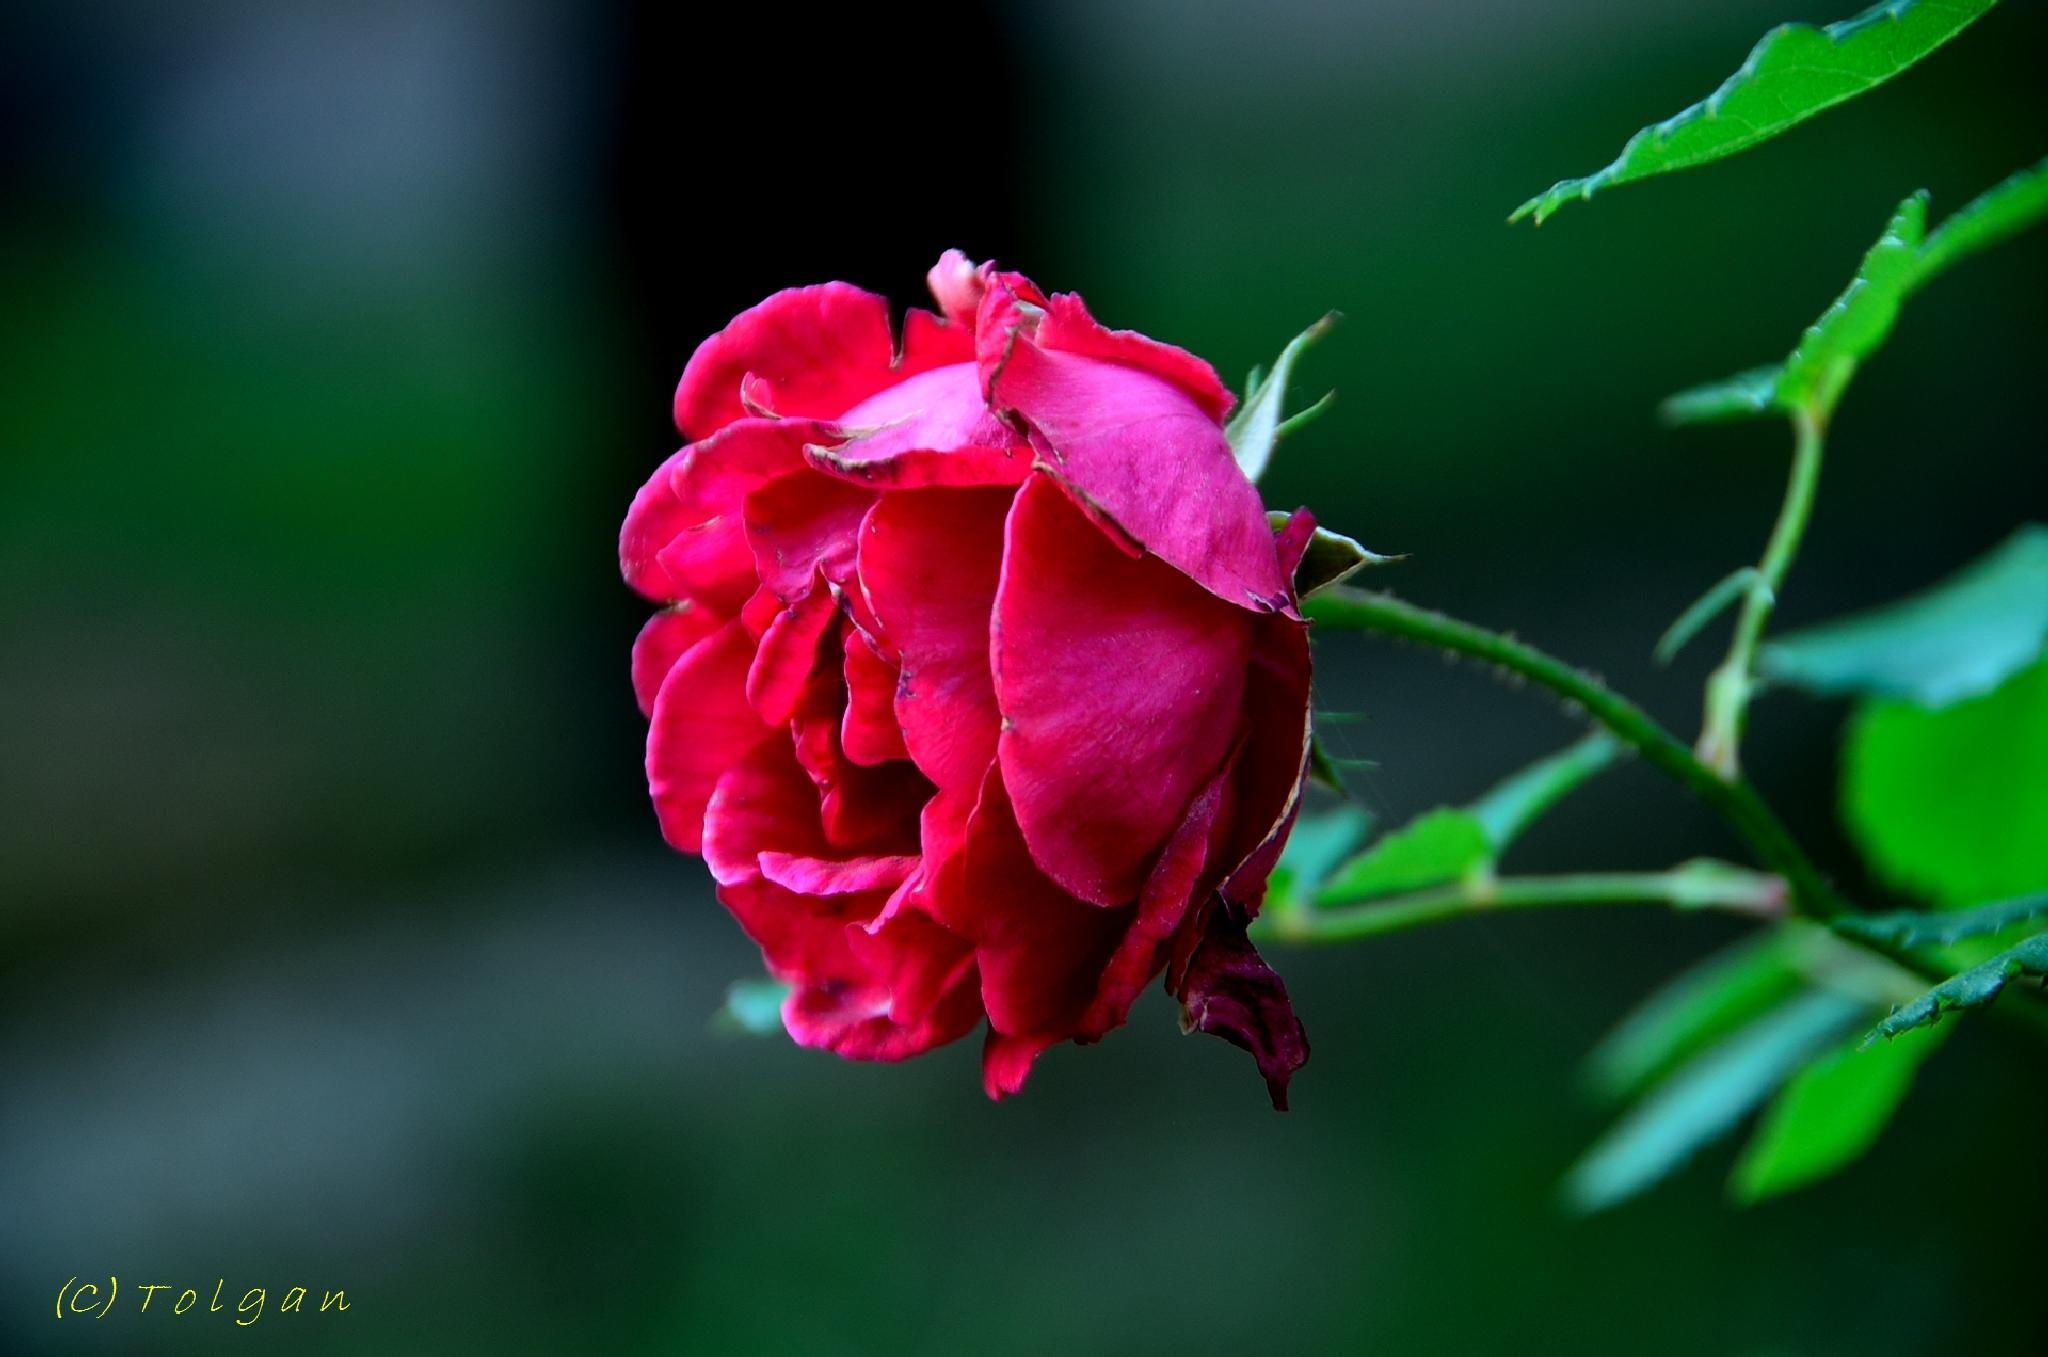 Rose by Tolgan ÖZEN